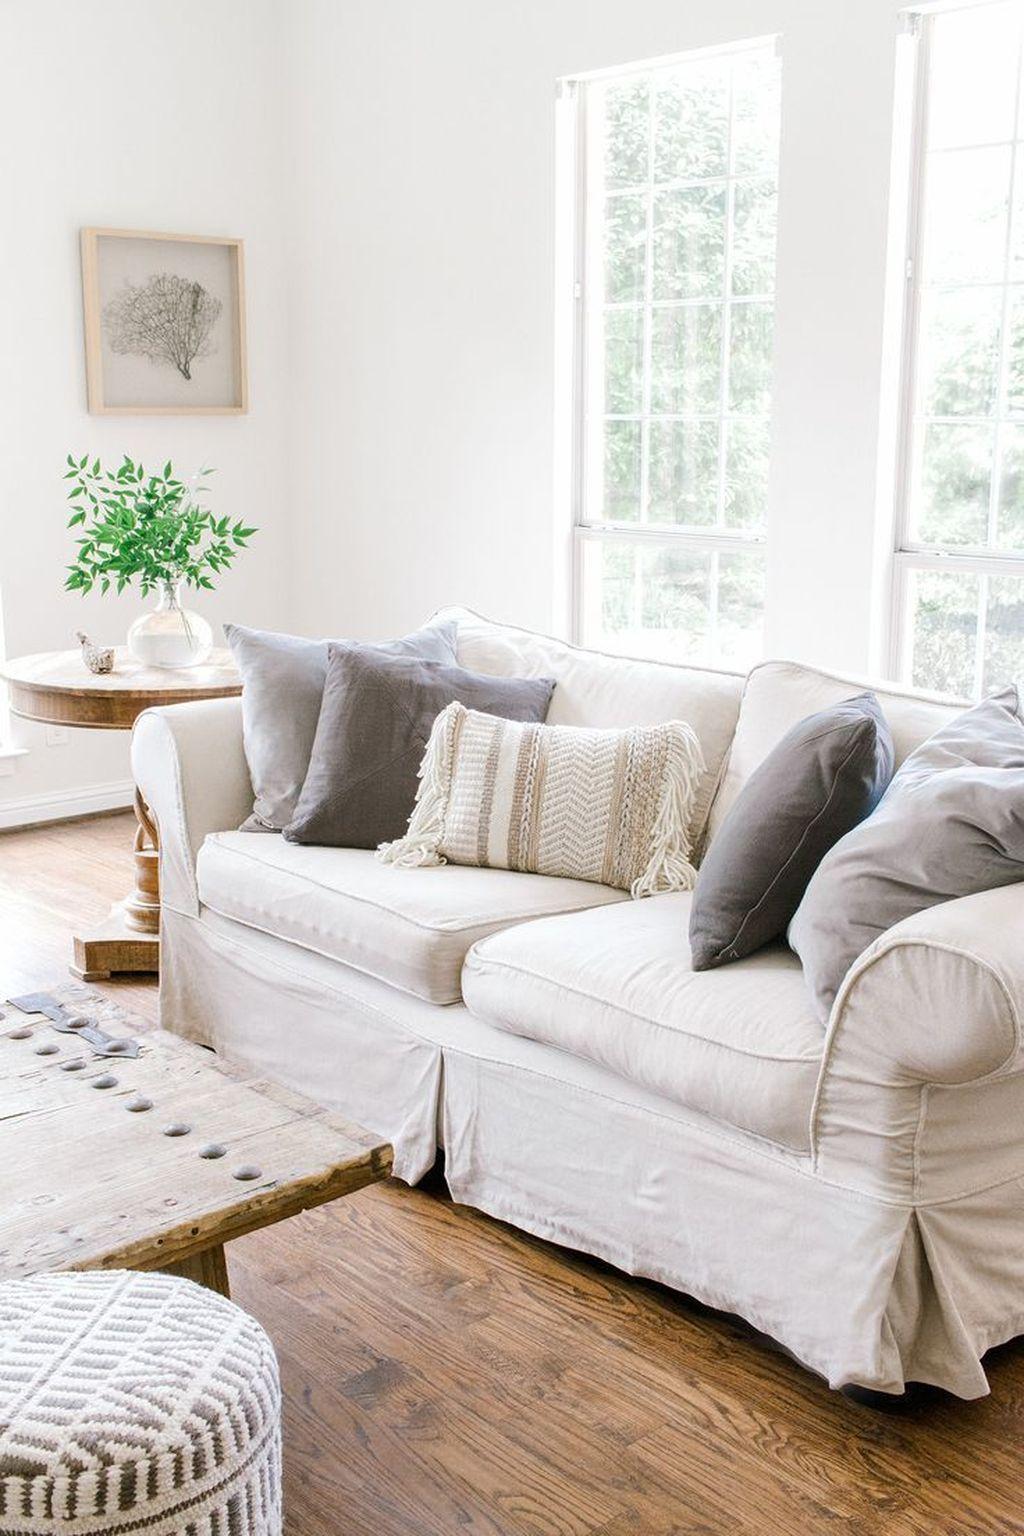 Rustic Farmhouse Furniture Design Ideas For Living Room 04